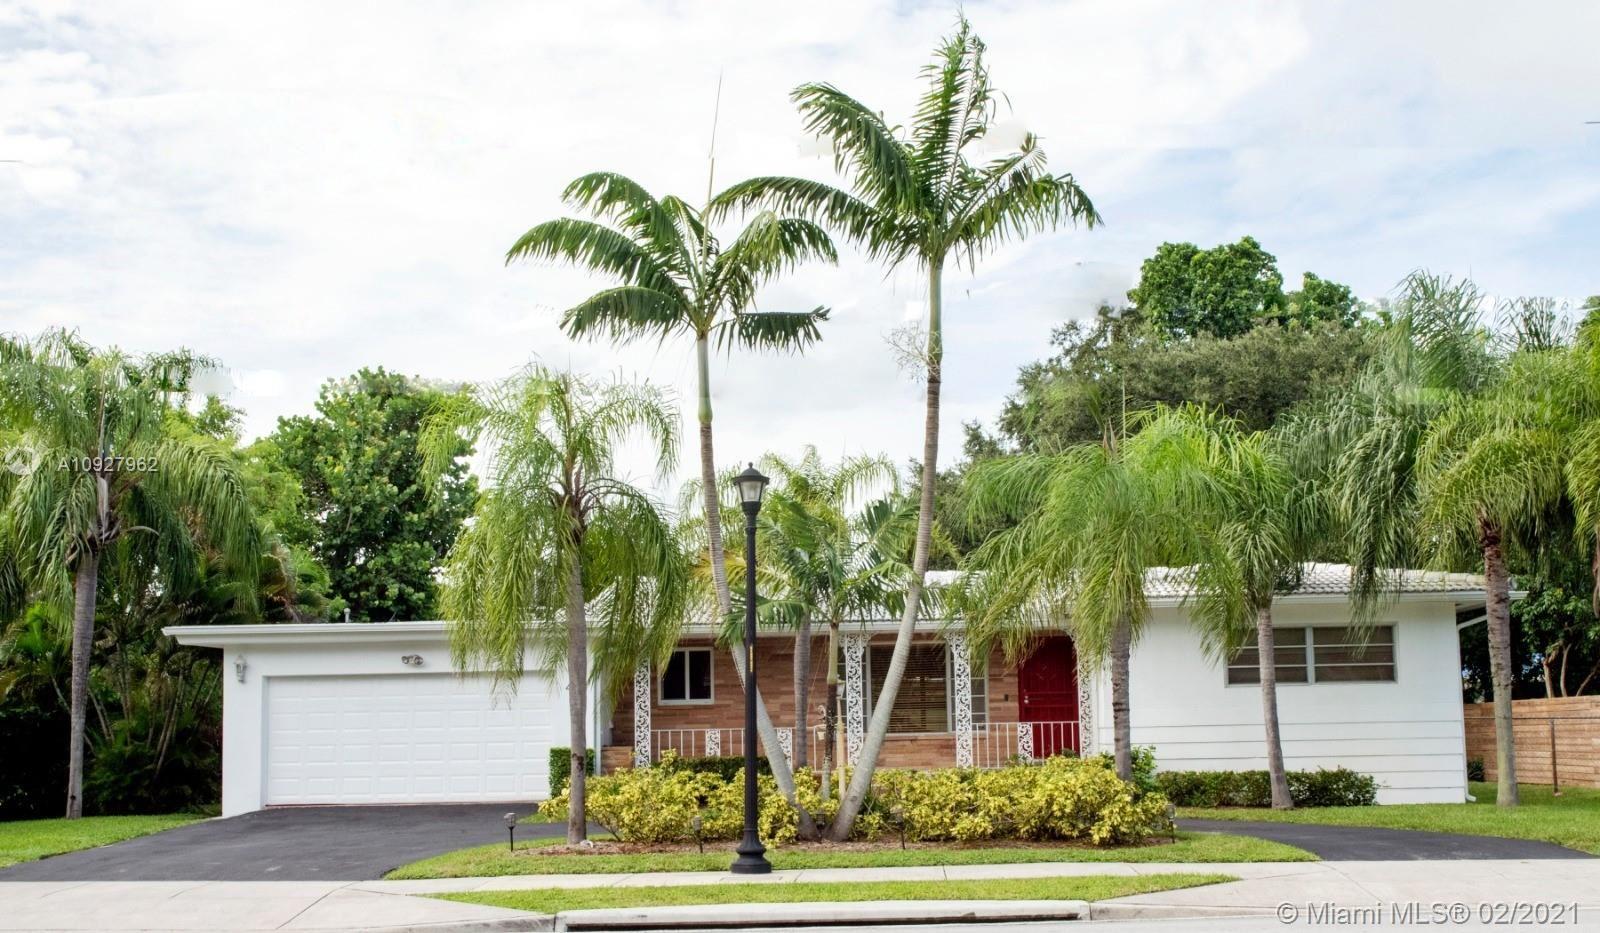 45 NW 103rd St, Miami Shores, FL 33150 - #: A10927962